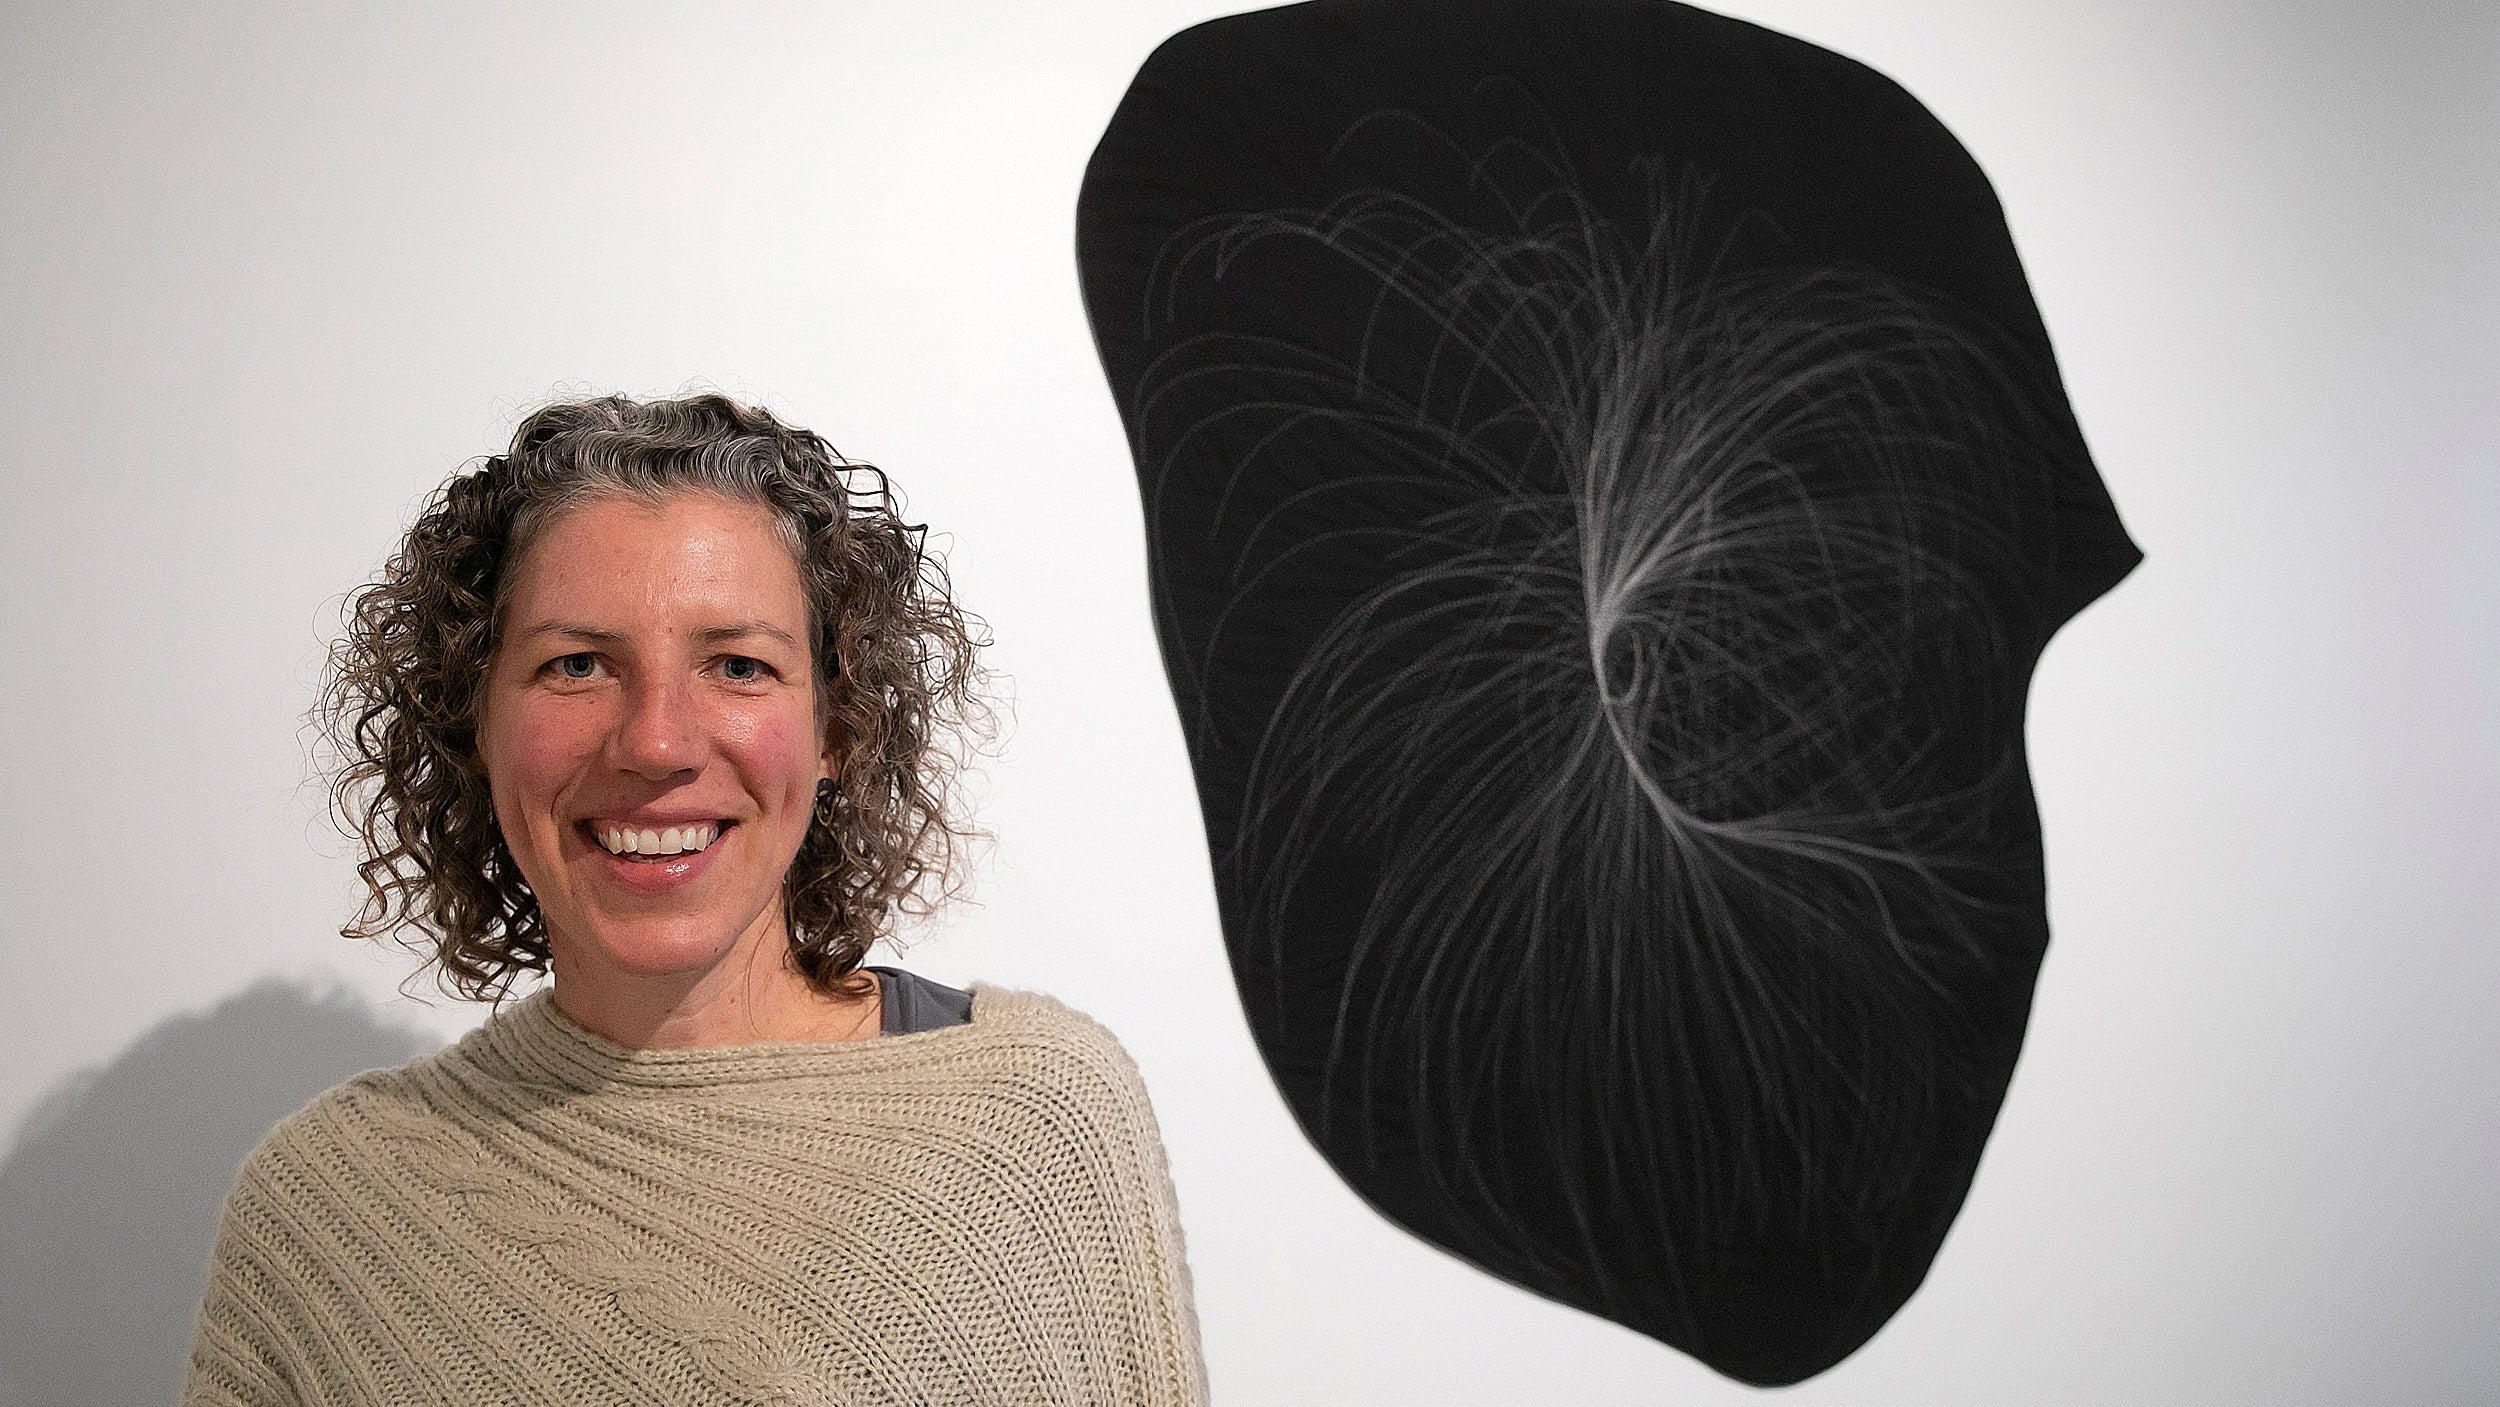 Artist Anna von Mertens with one of her quilts mapping stars.